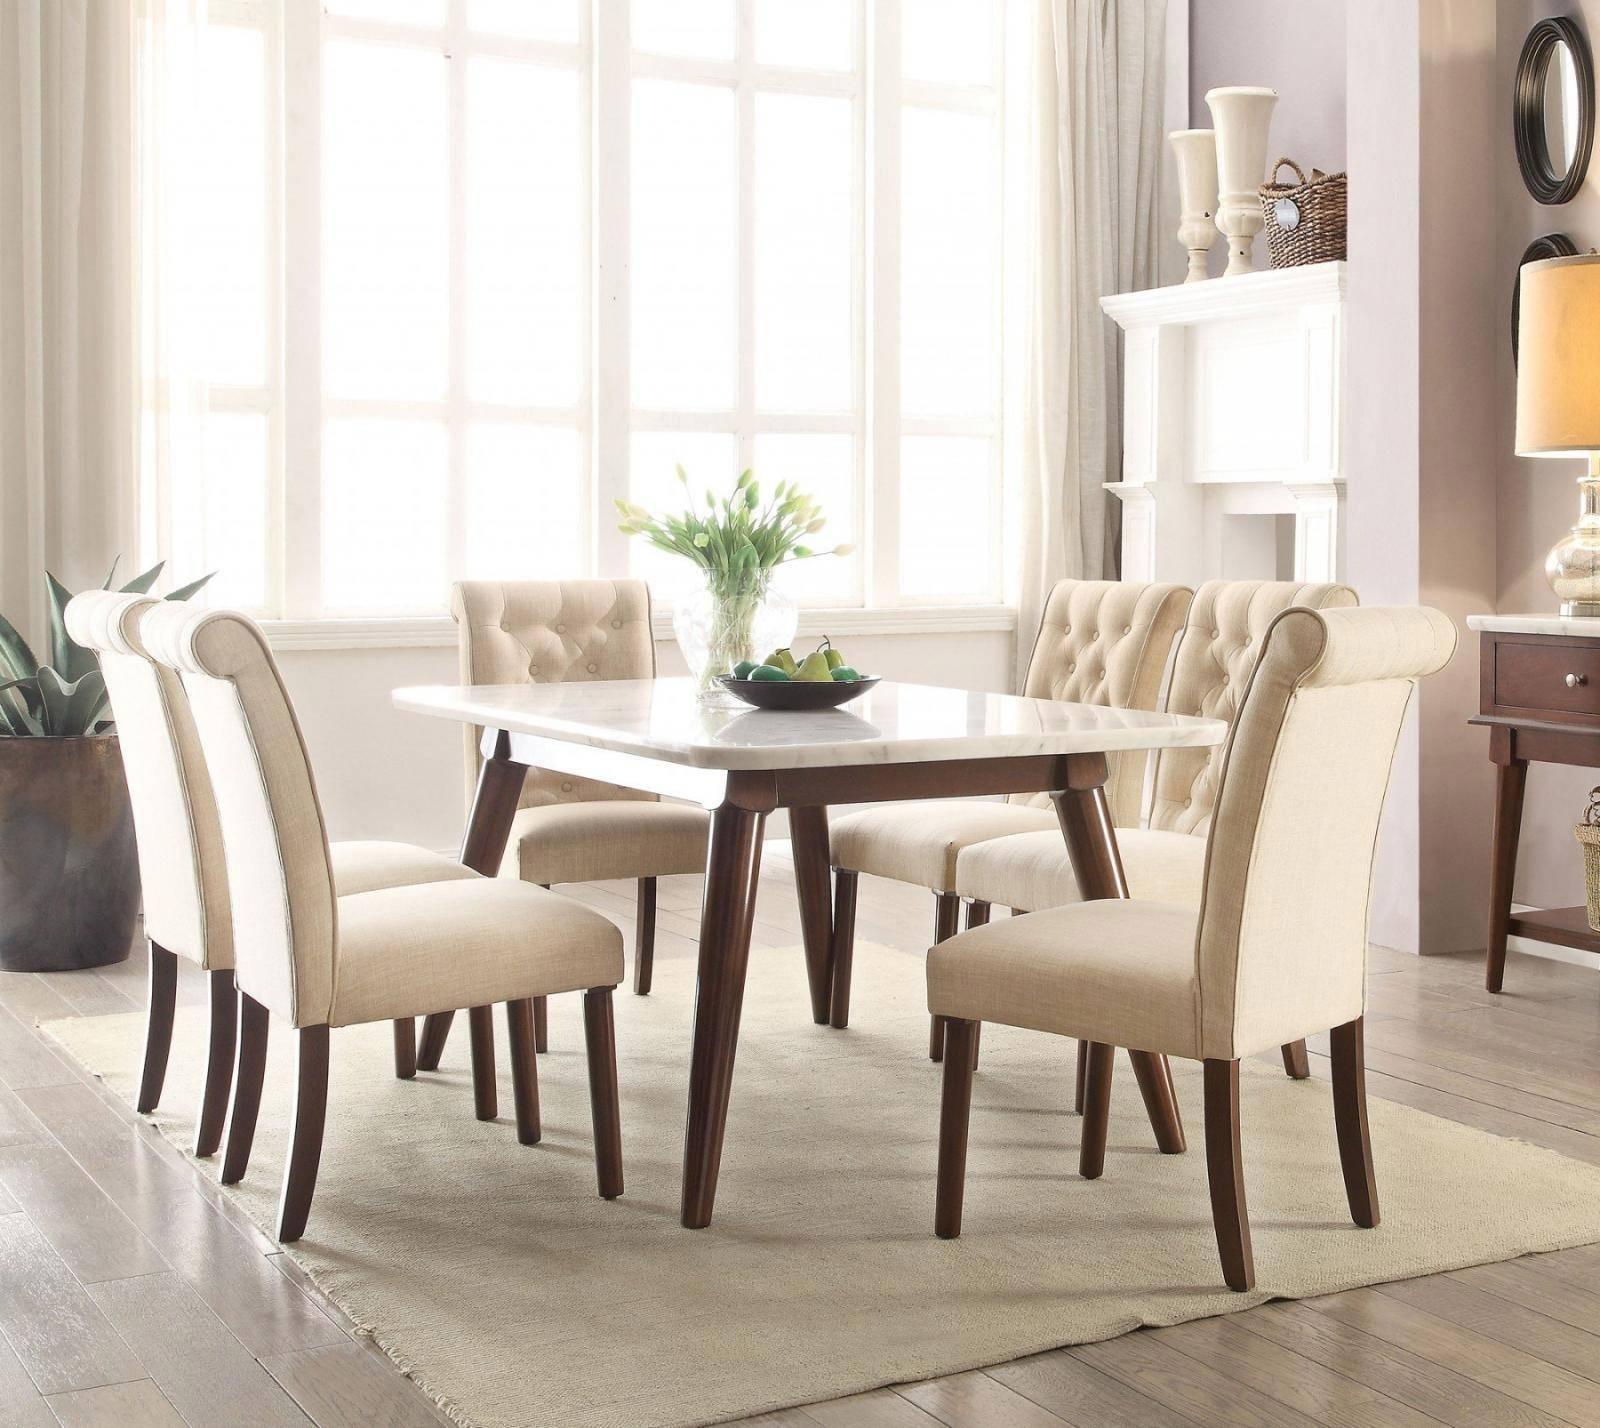 Buy ACME Gasha 72820 Dining Table Set 7 Pcs in White, Walnut, Linen online